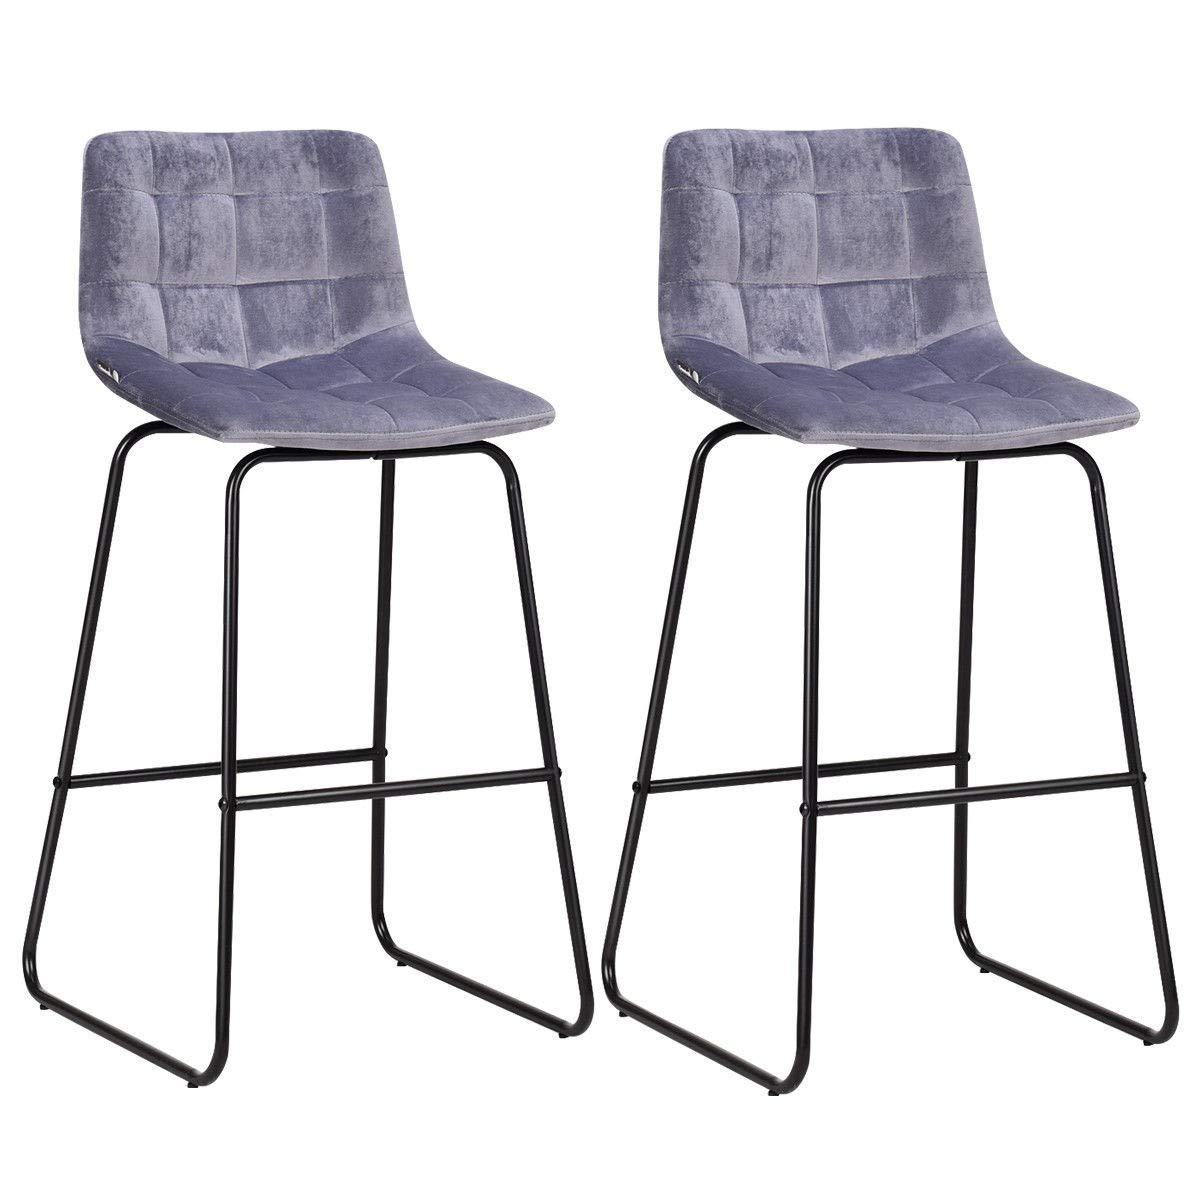 Admirable Amazon Com King 77777 Set Of 2 Velvet Bar Stools Pub Machost Co Dining Chair Design Ideas Machostcouk